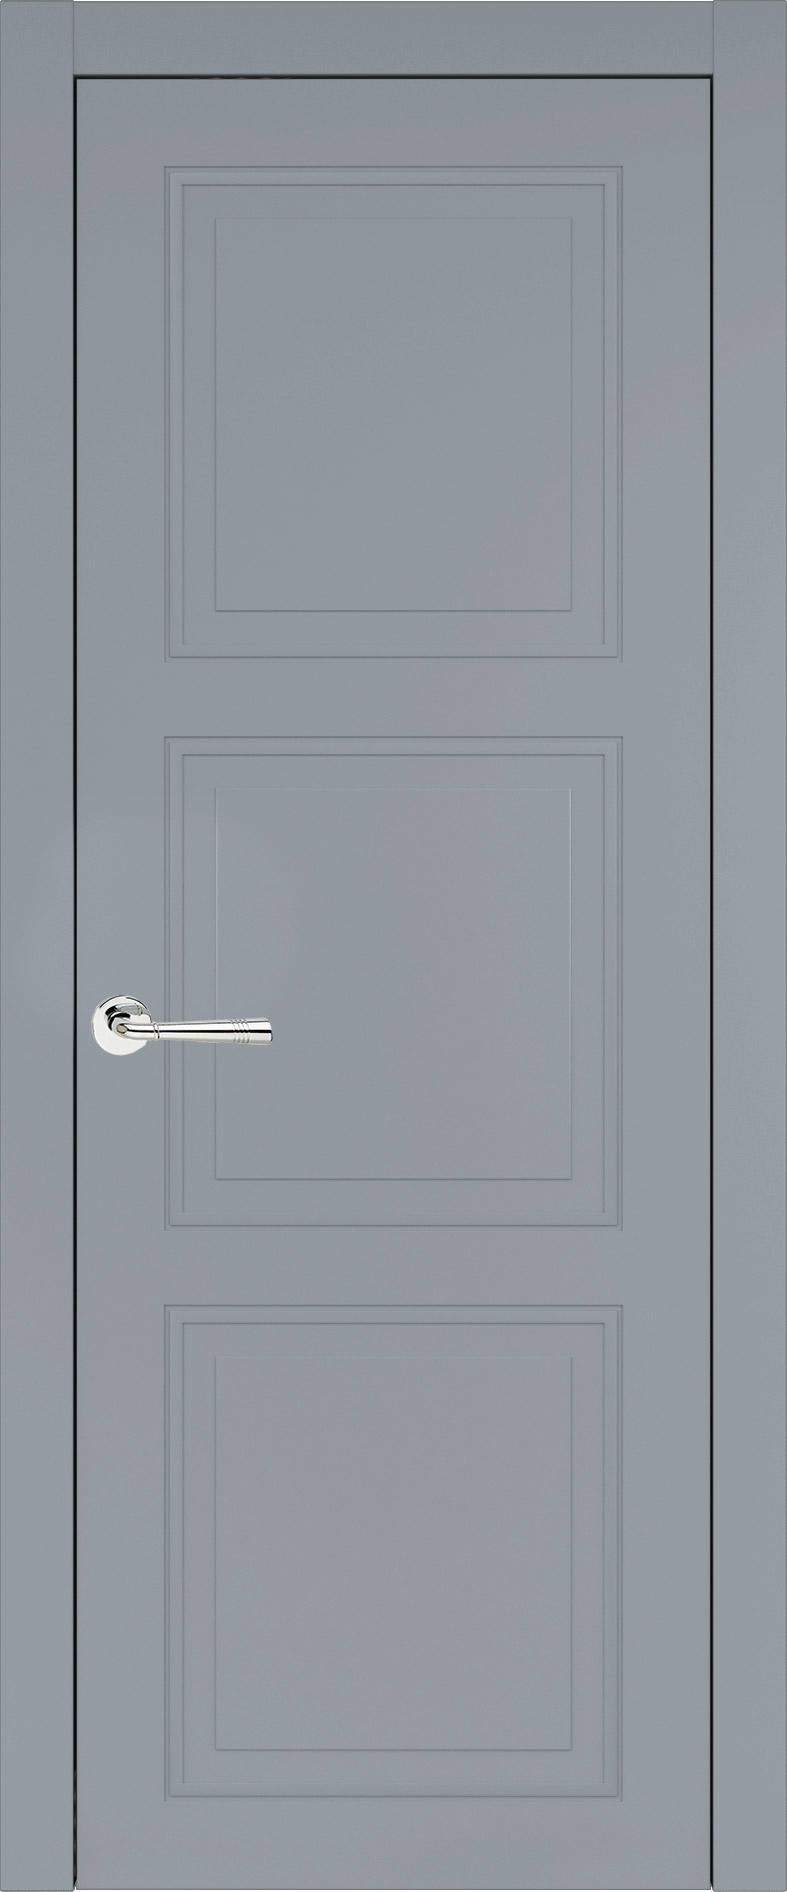 Milano Neo Classic цвет - Серебристо-серая эмаль (RAL 7045) Без стекла (ДГ)